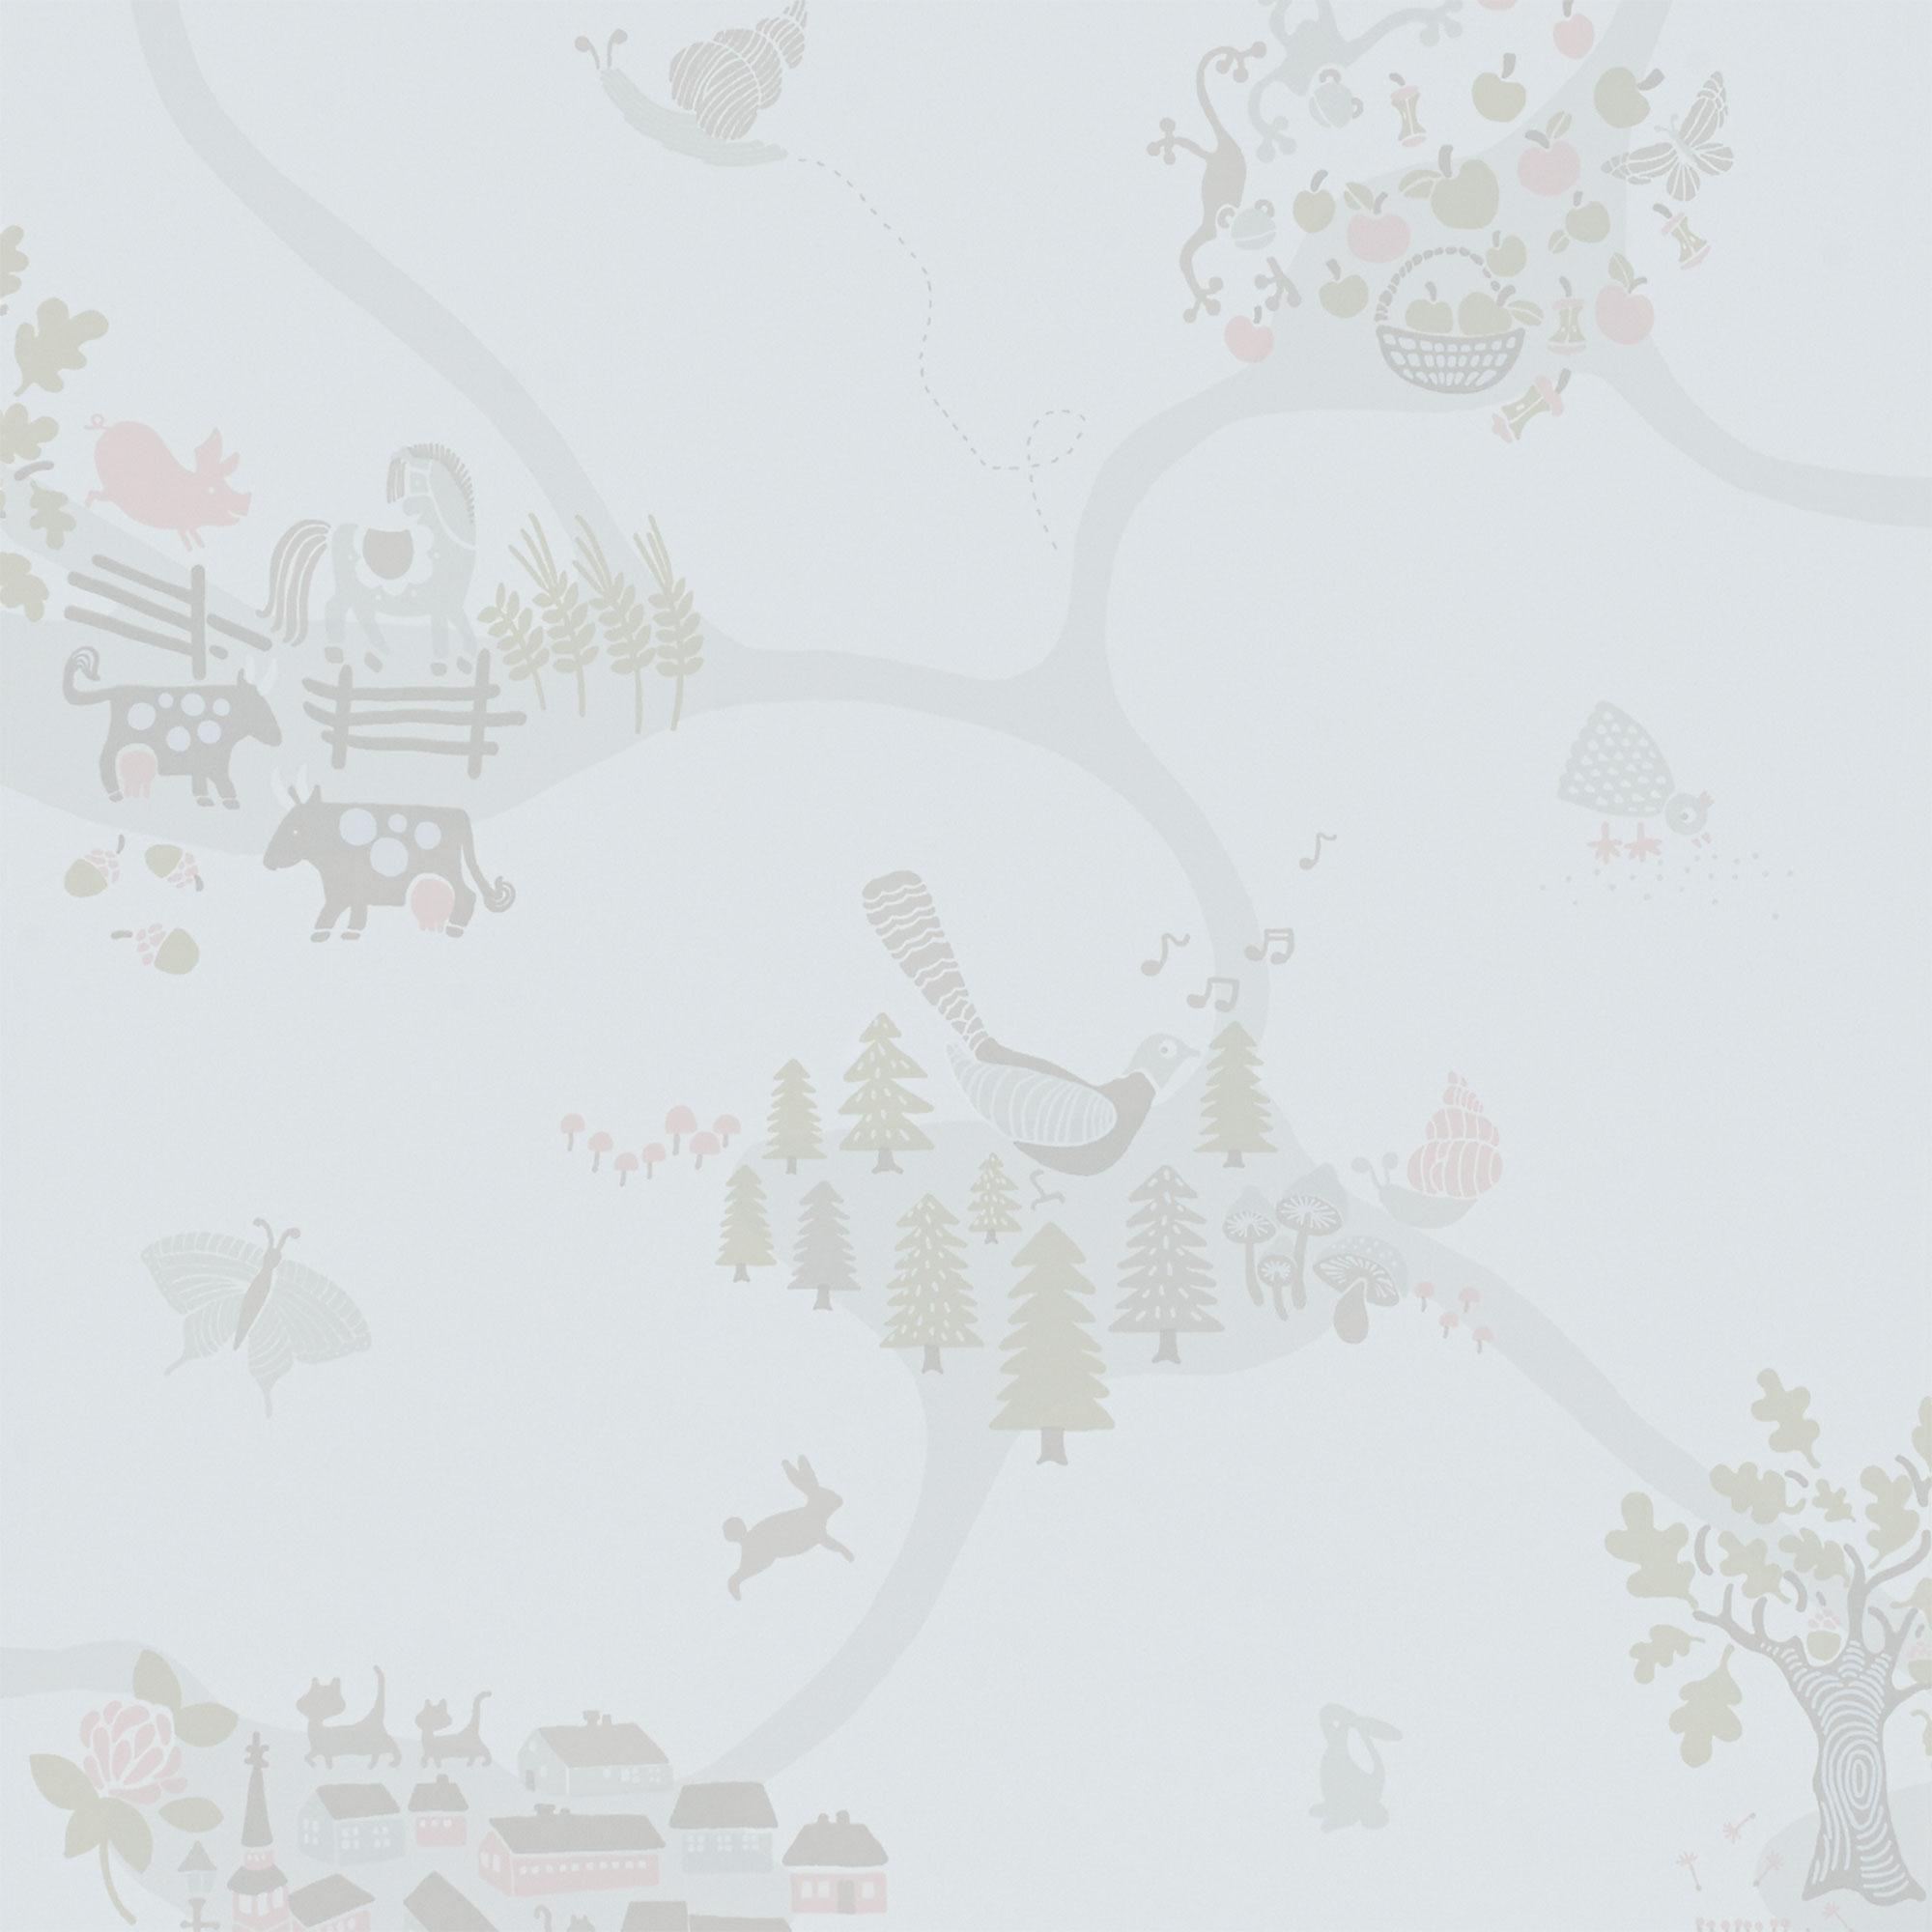 Шведские обои Sandberg,  коллекция Engla & Elliot, артикул779-09